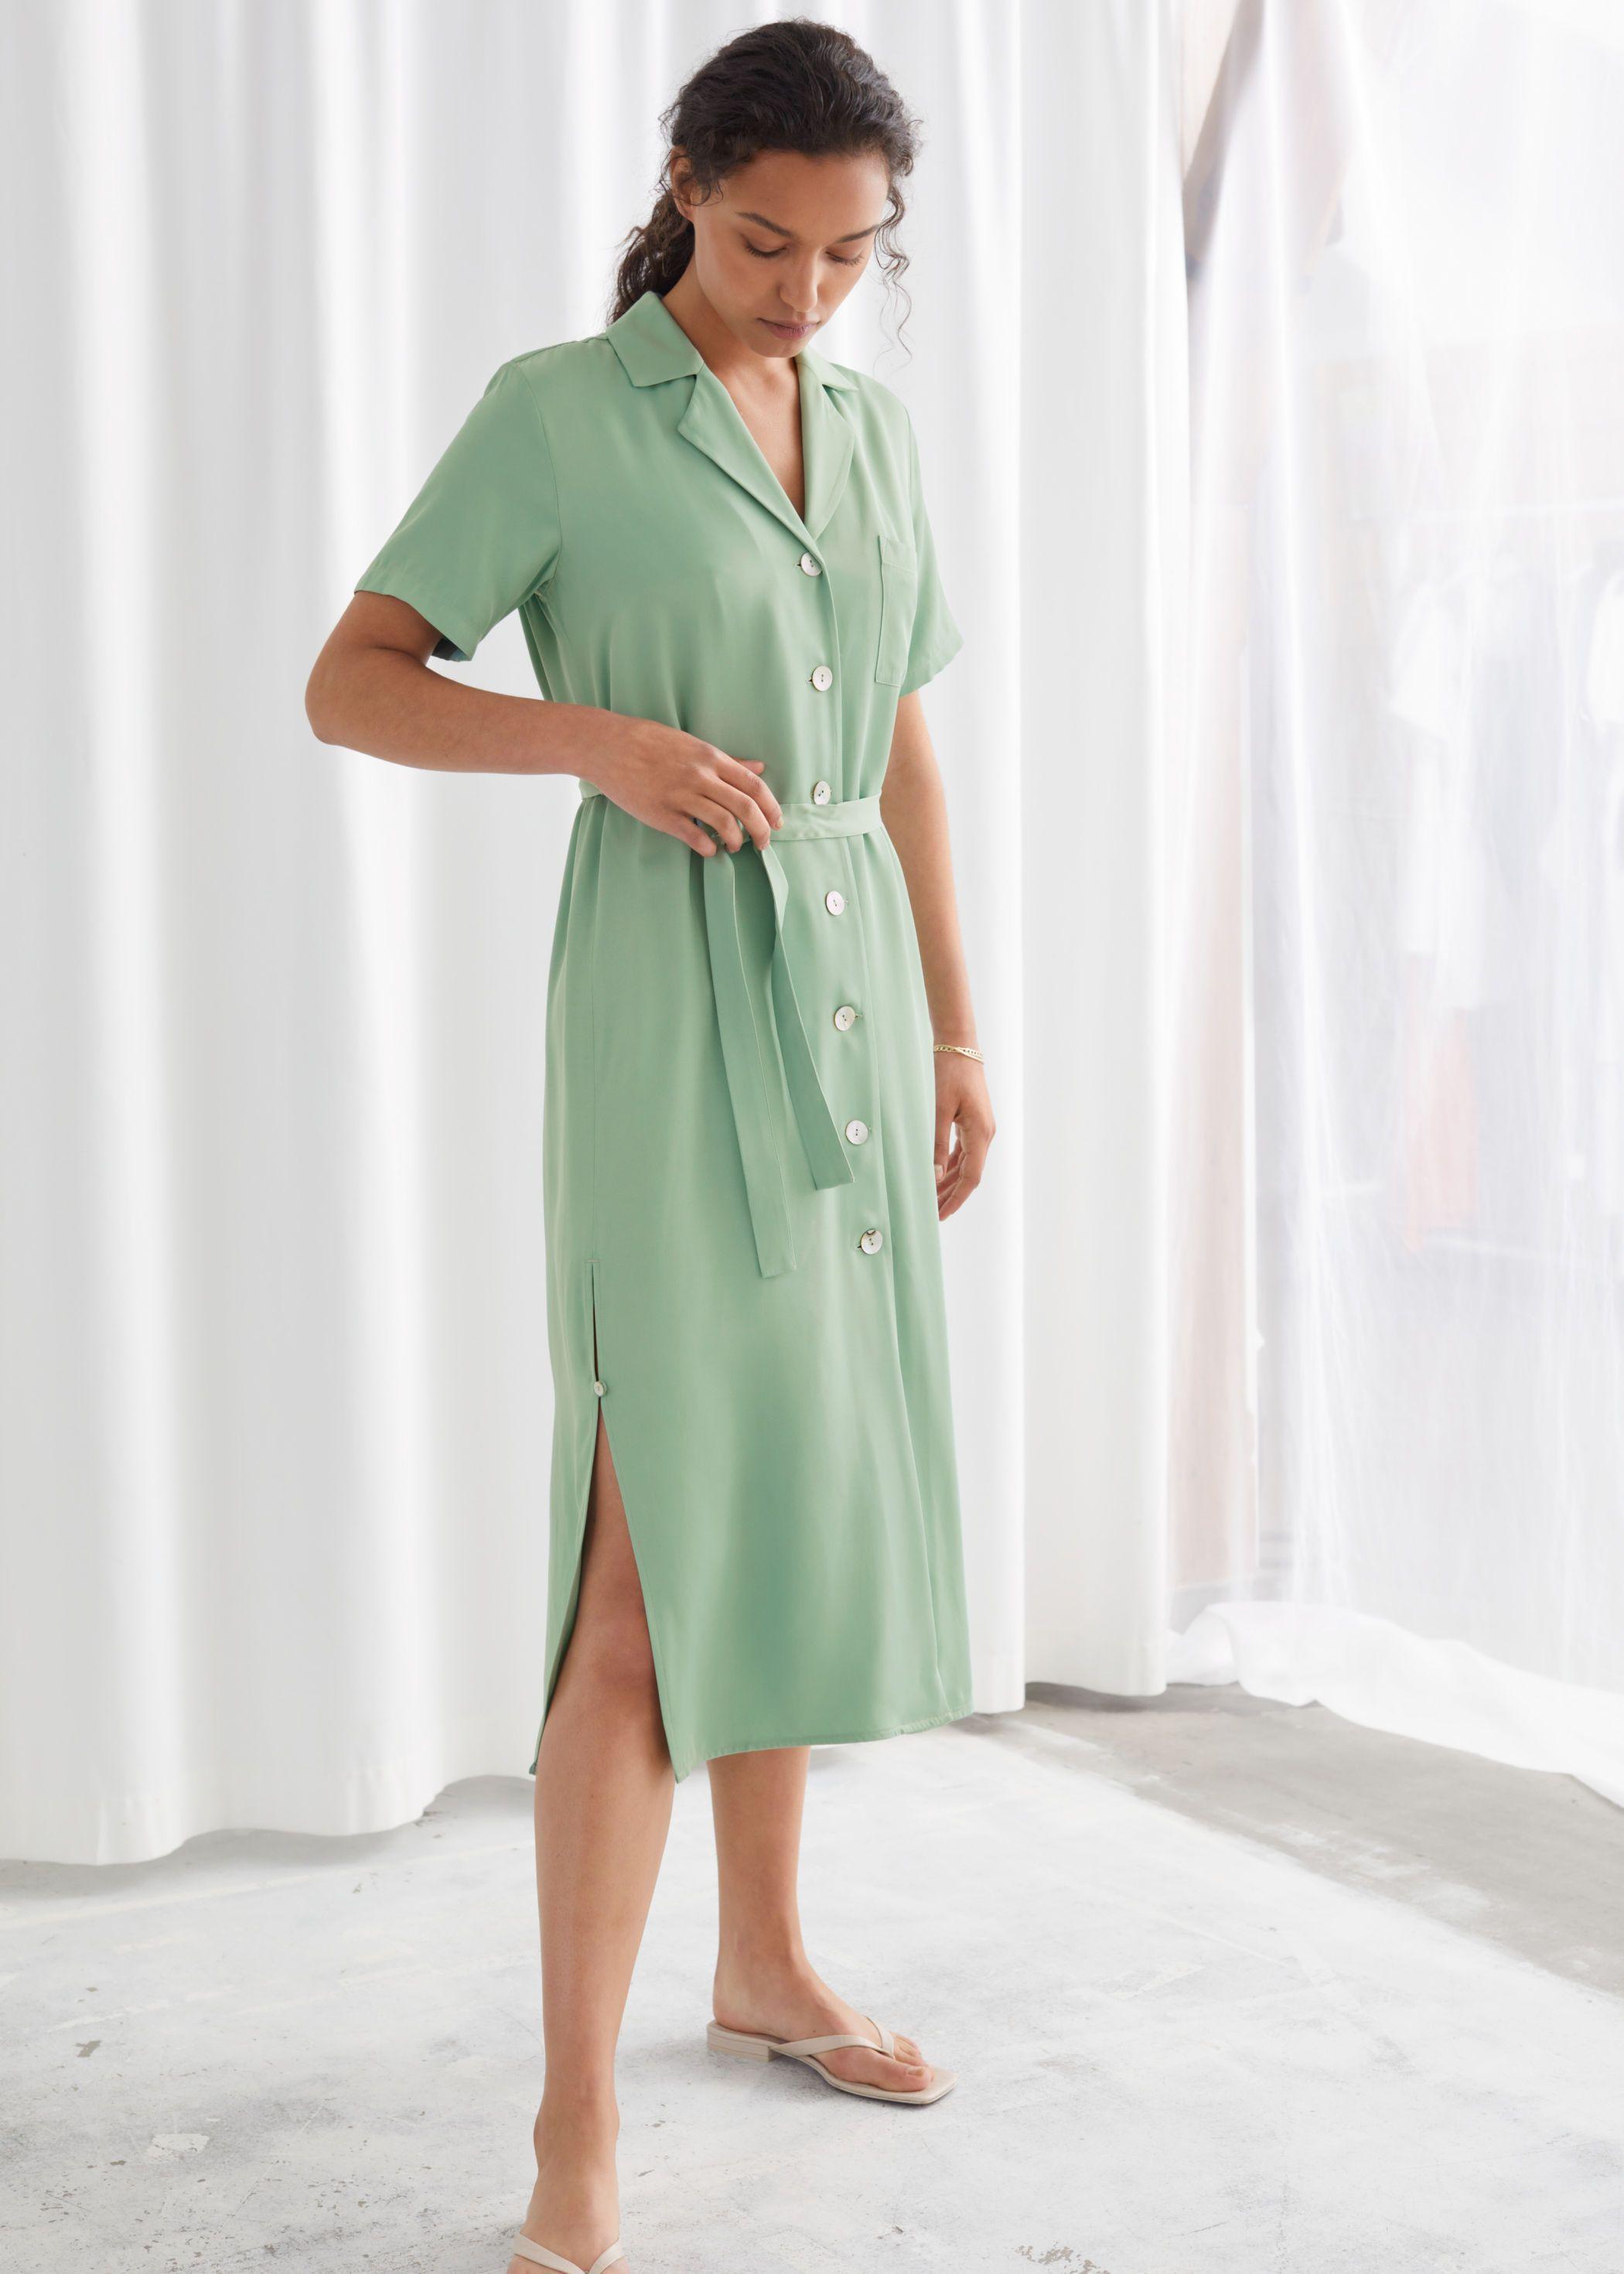 Satin Shirt Midi Dress Midi Shirt Dress Shirt Dress Satin Shirt [ 2940 x 2100 Pixel ]